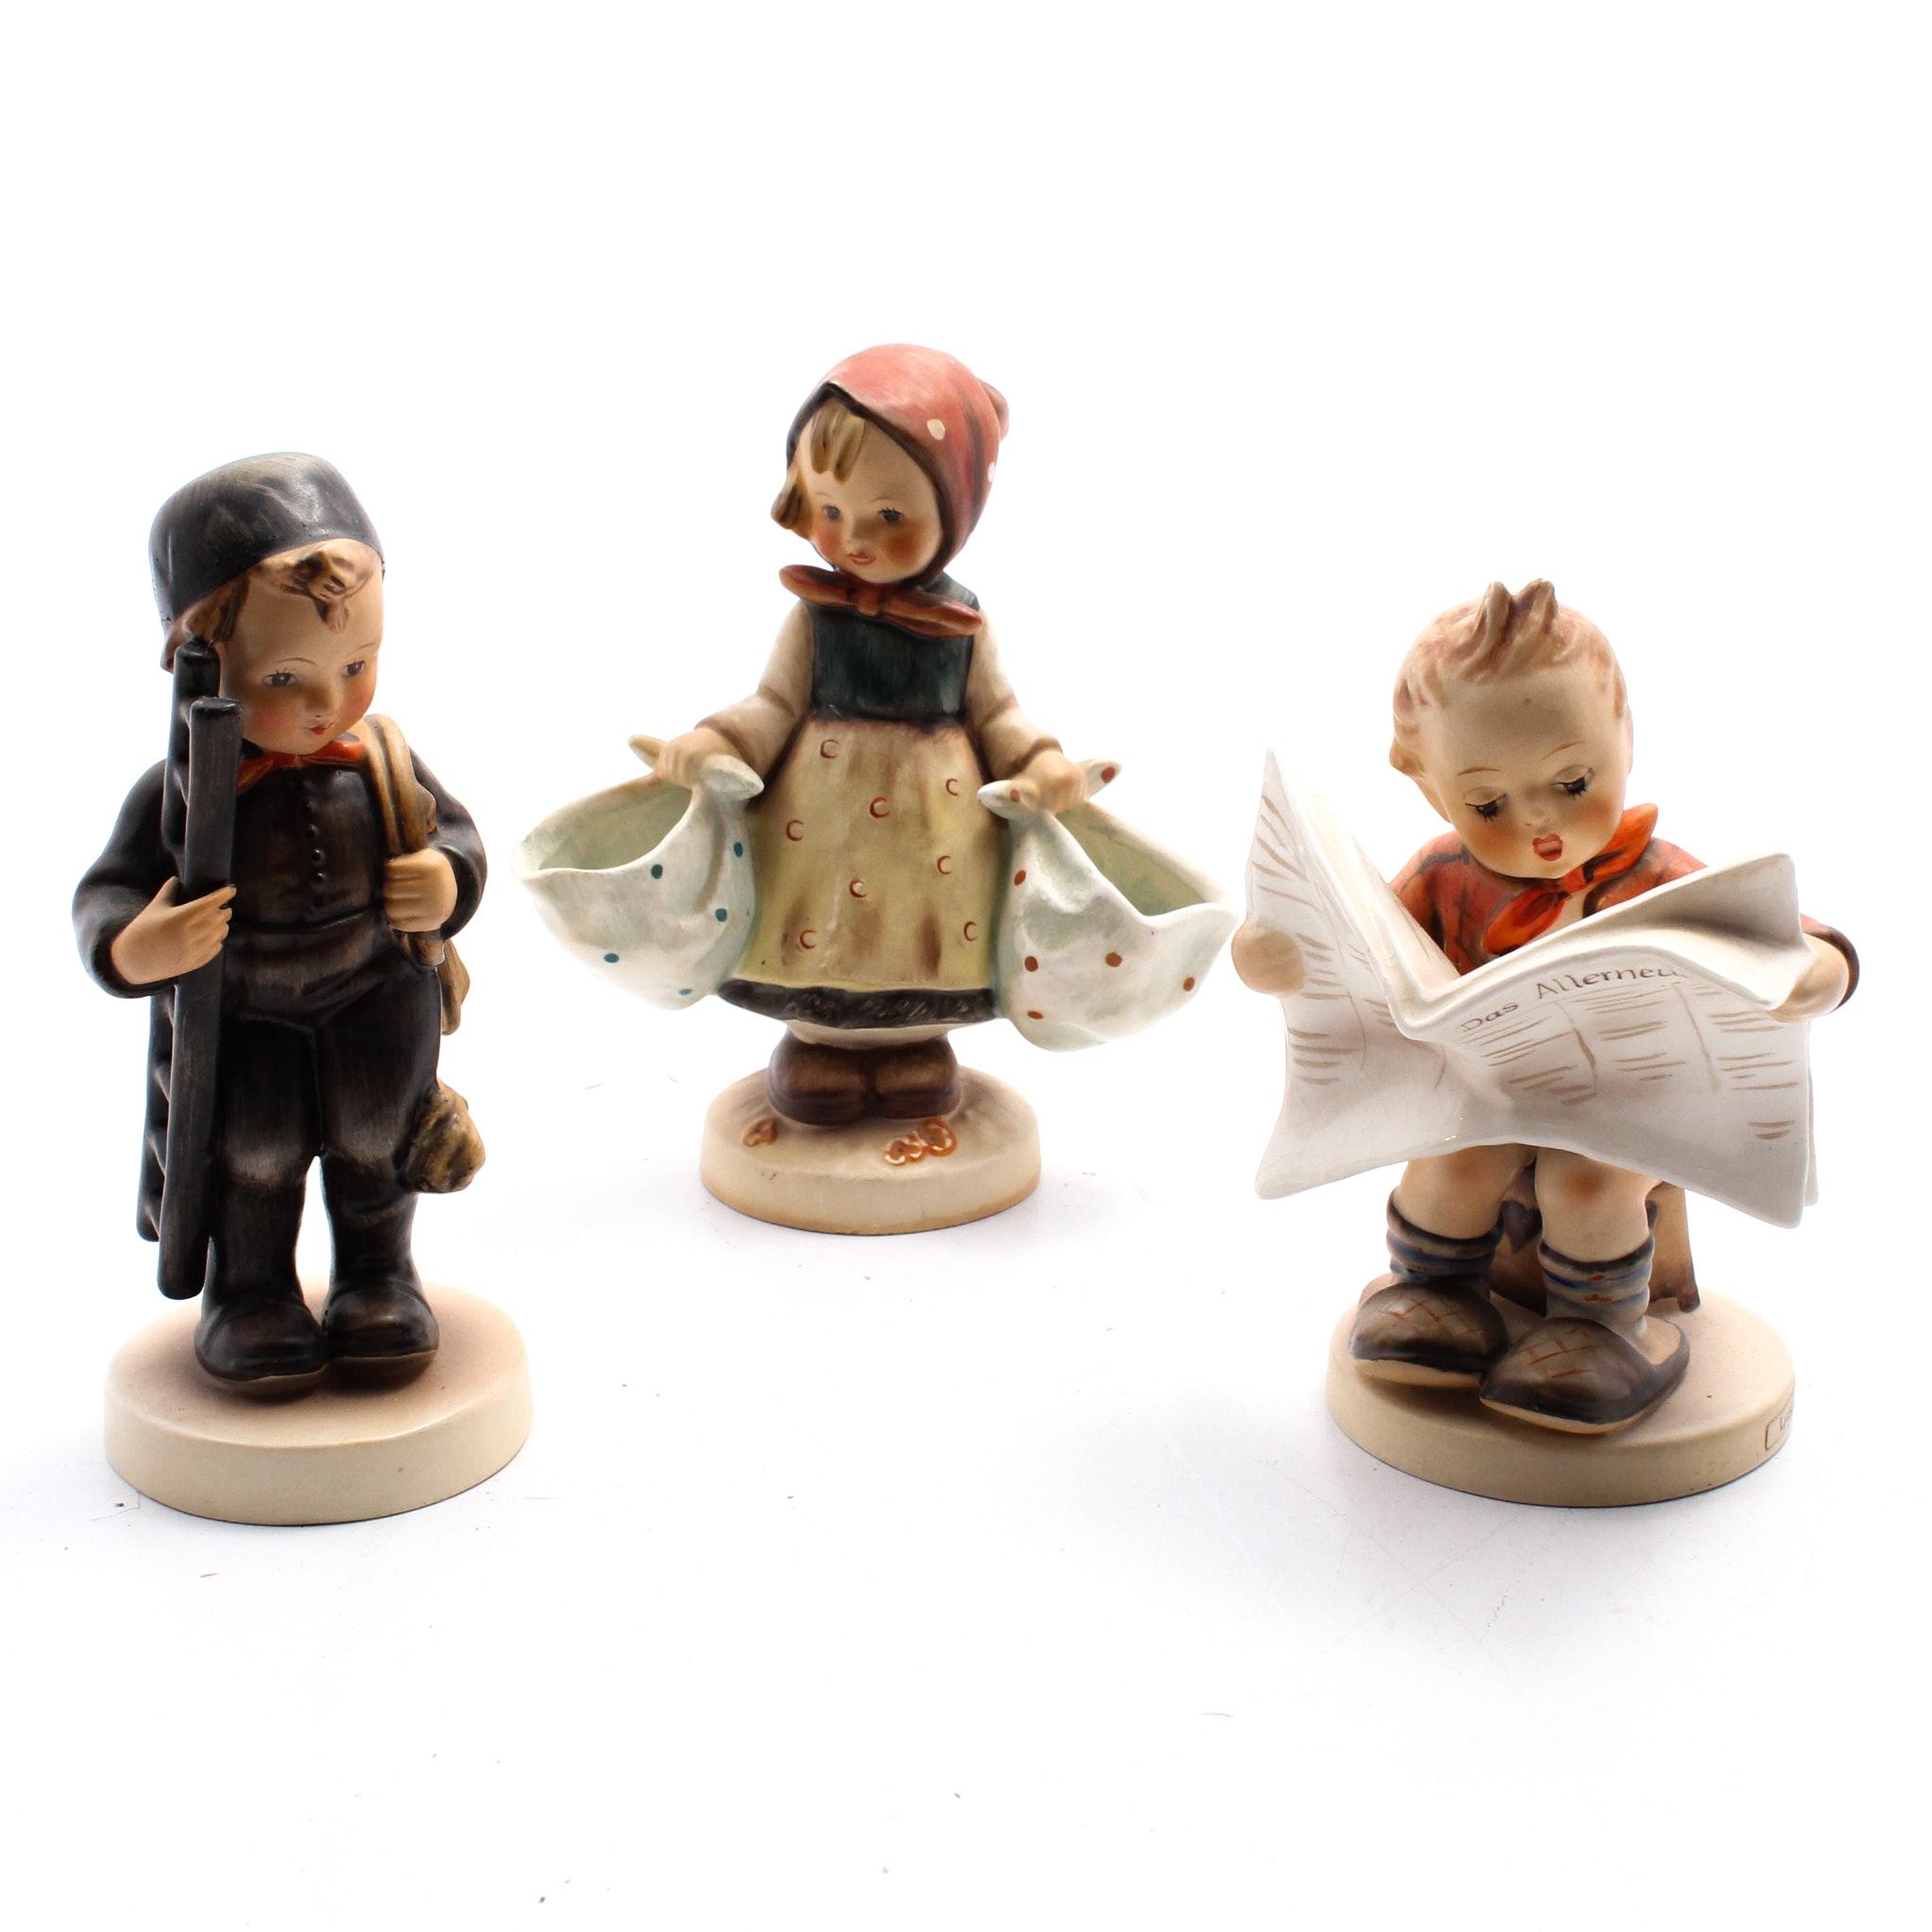 Goebel Hummel Ceramic Figurines